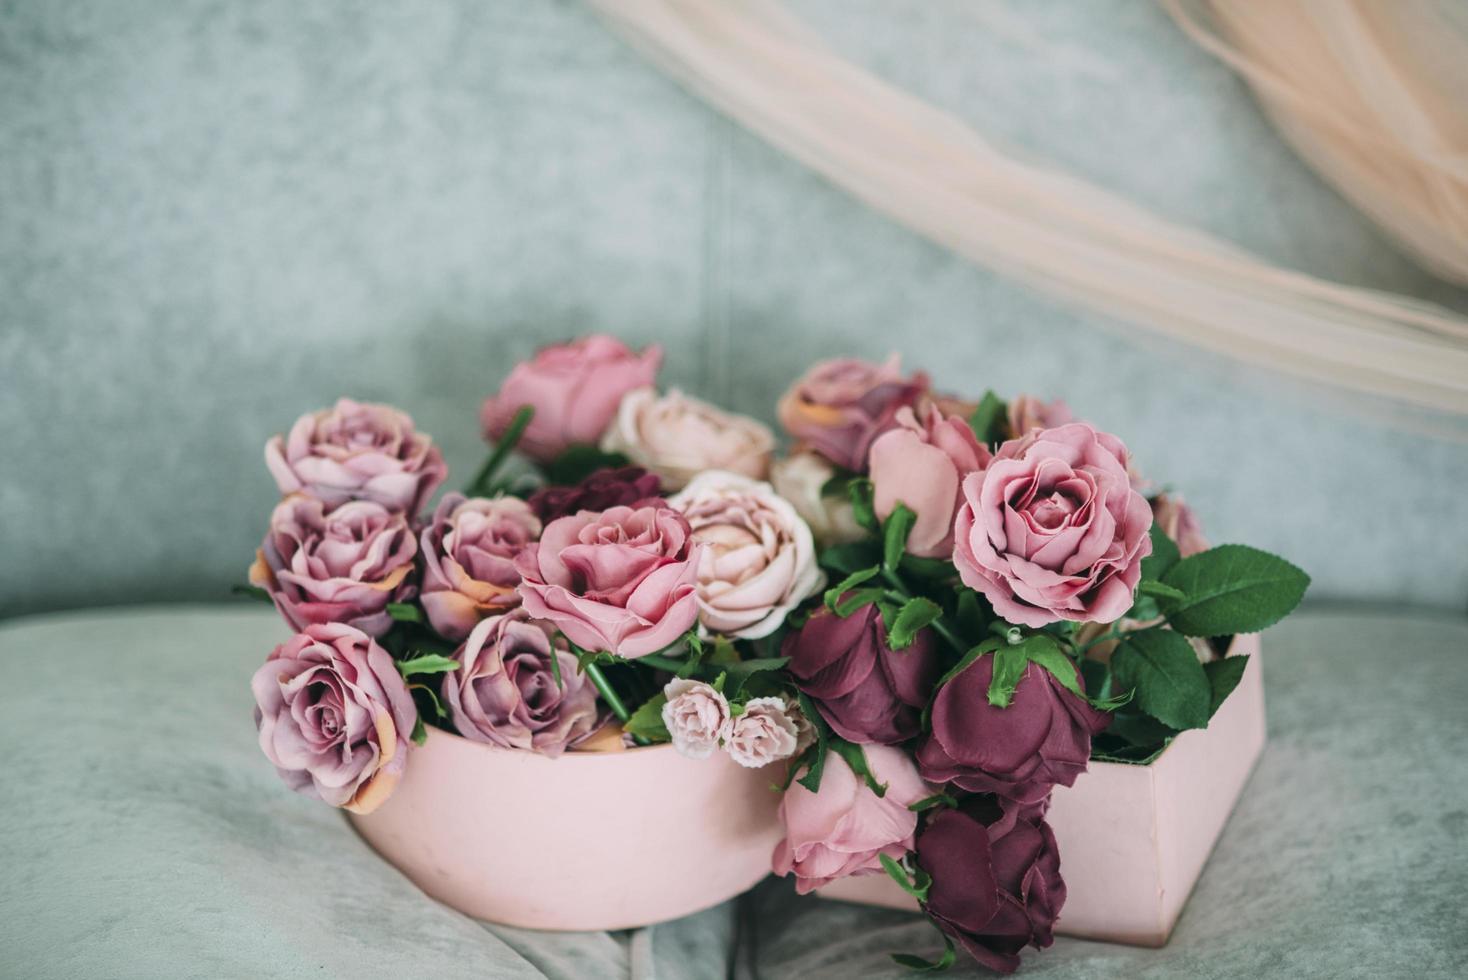 Pink and purple floral arrangement photo